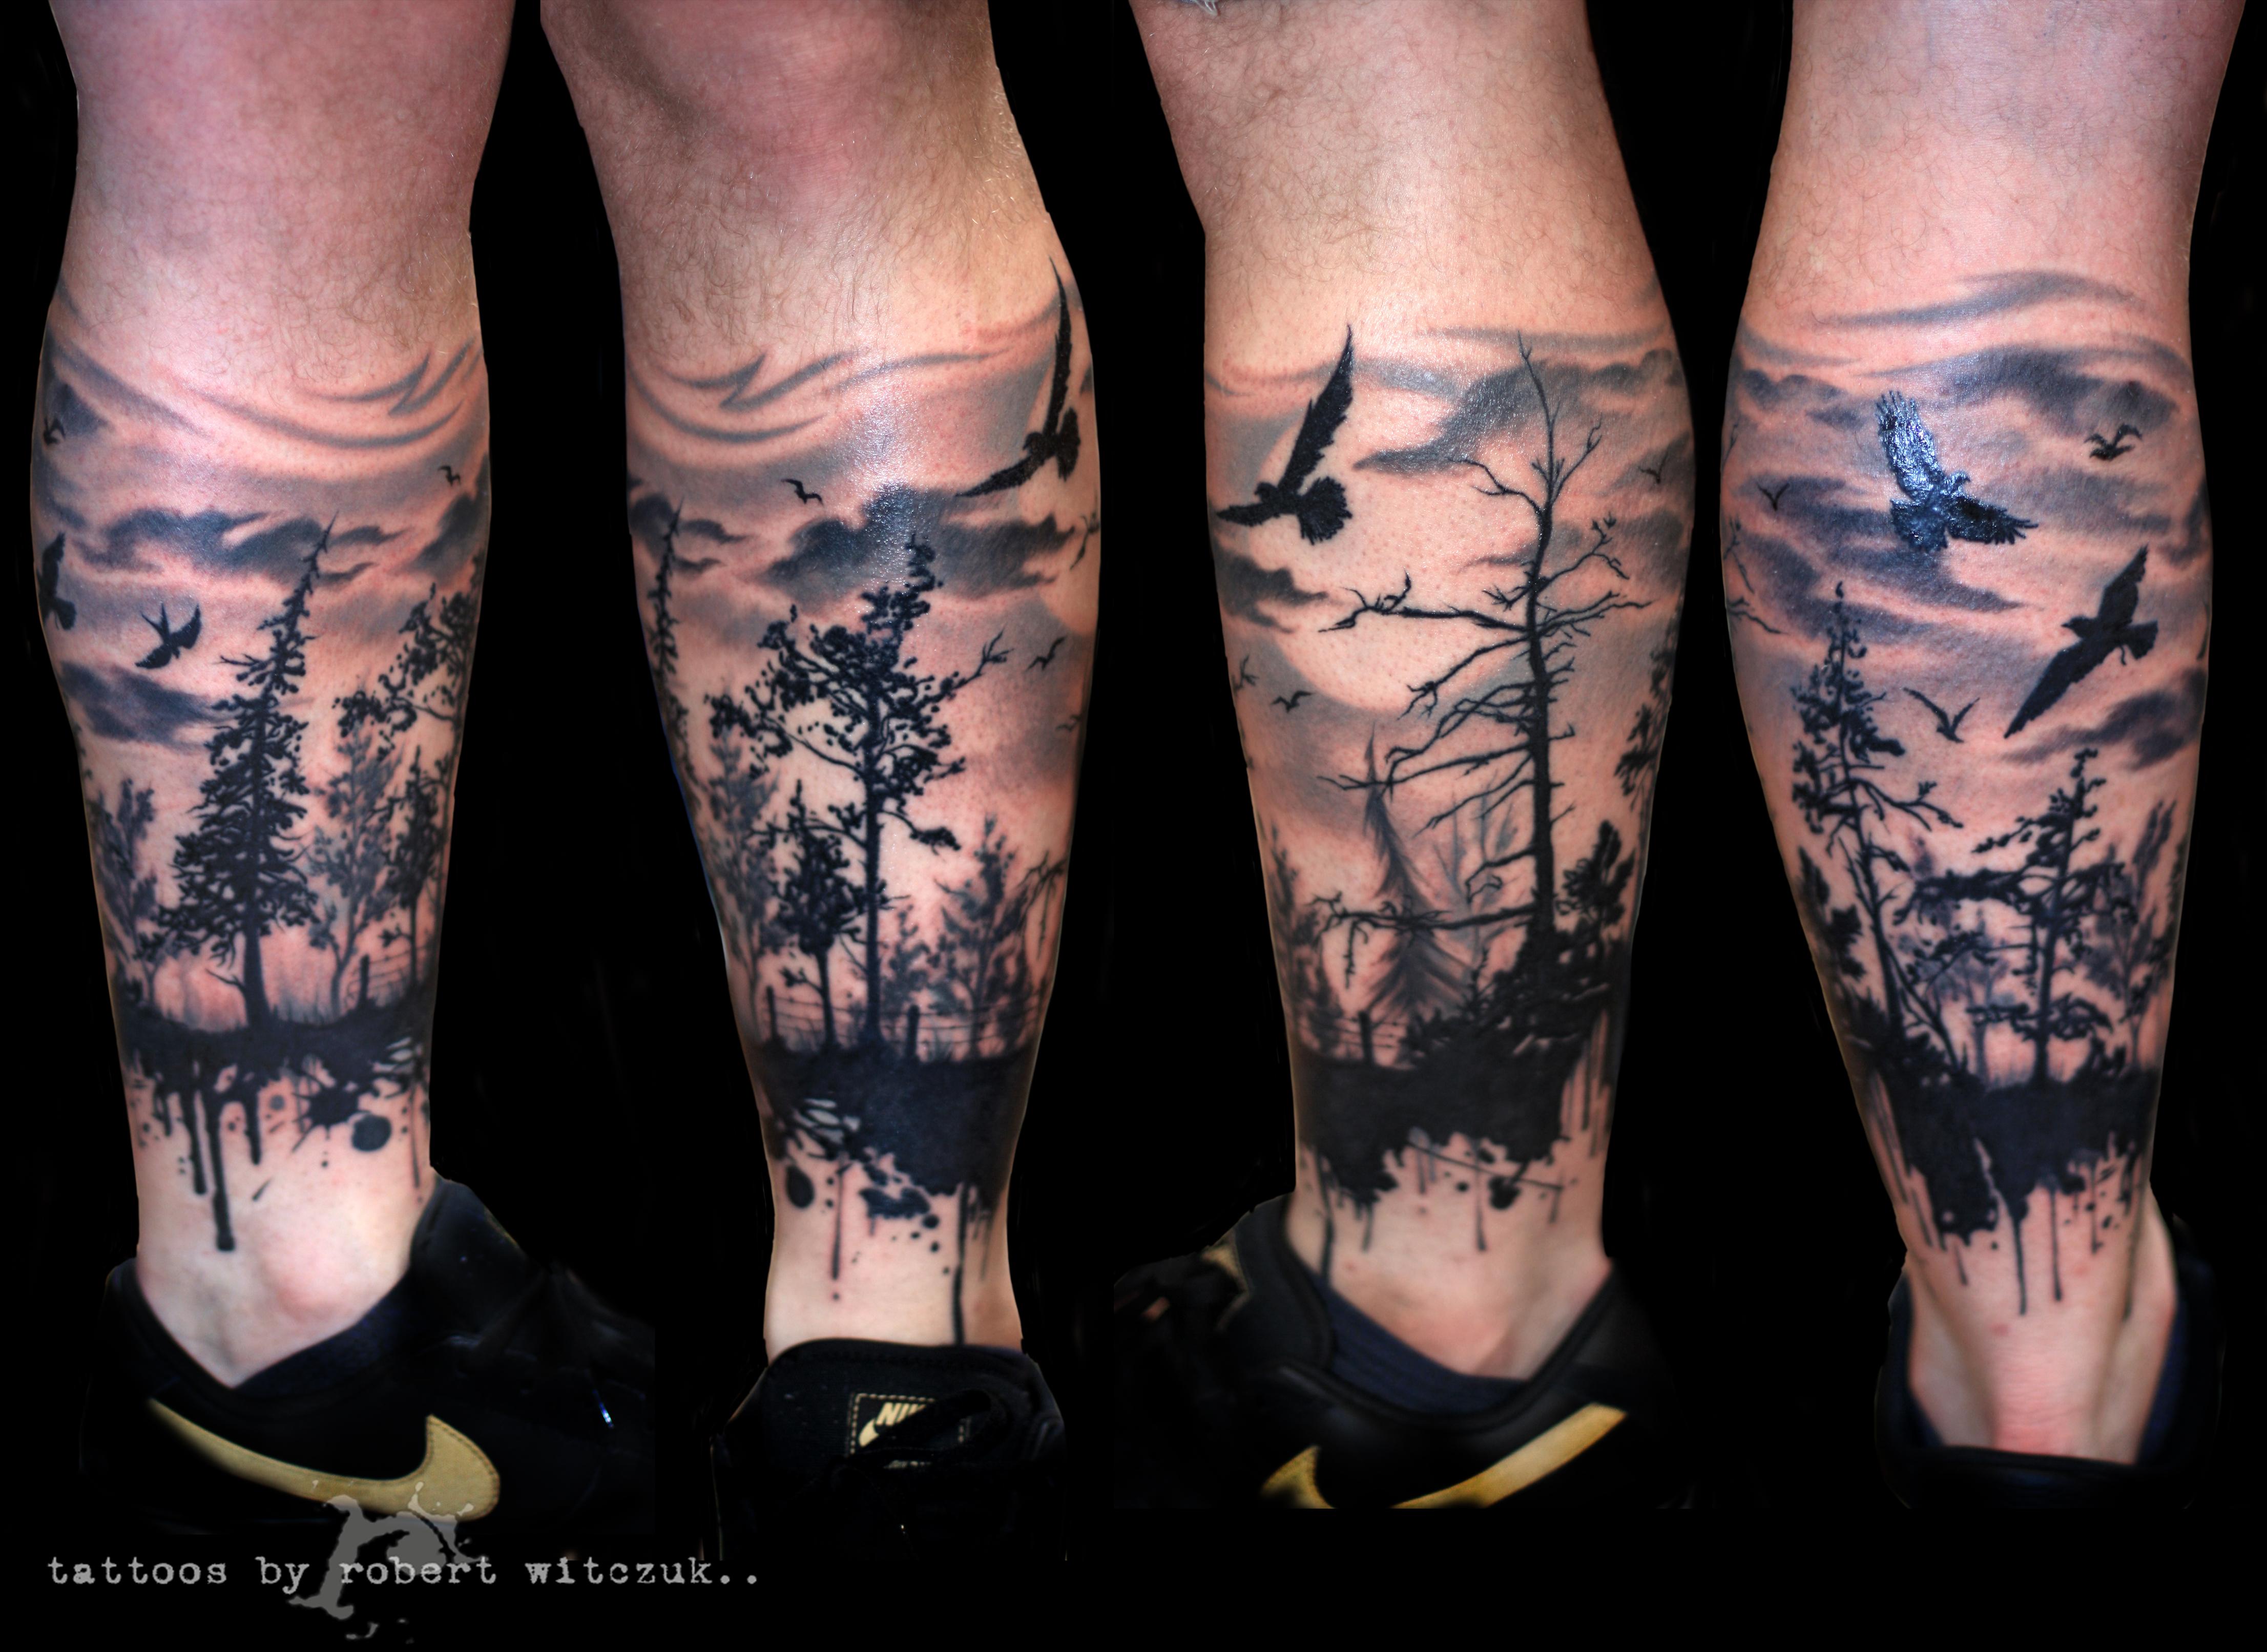 Good ankle tattoo ideas hlynur mar hlynurmar on pinterest